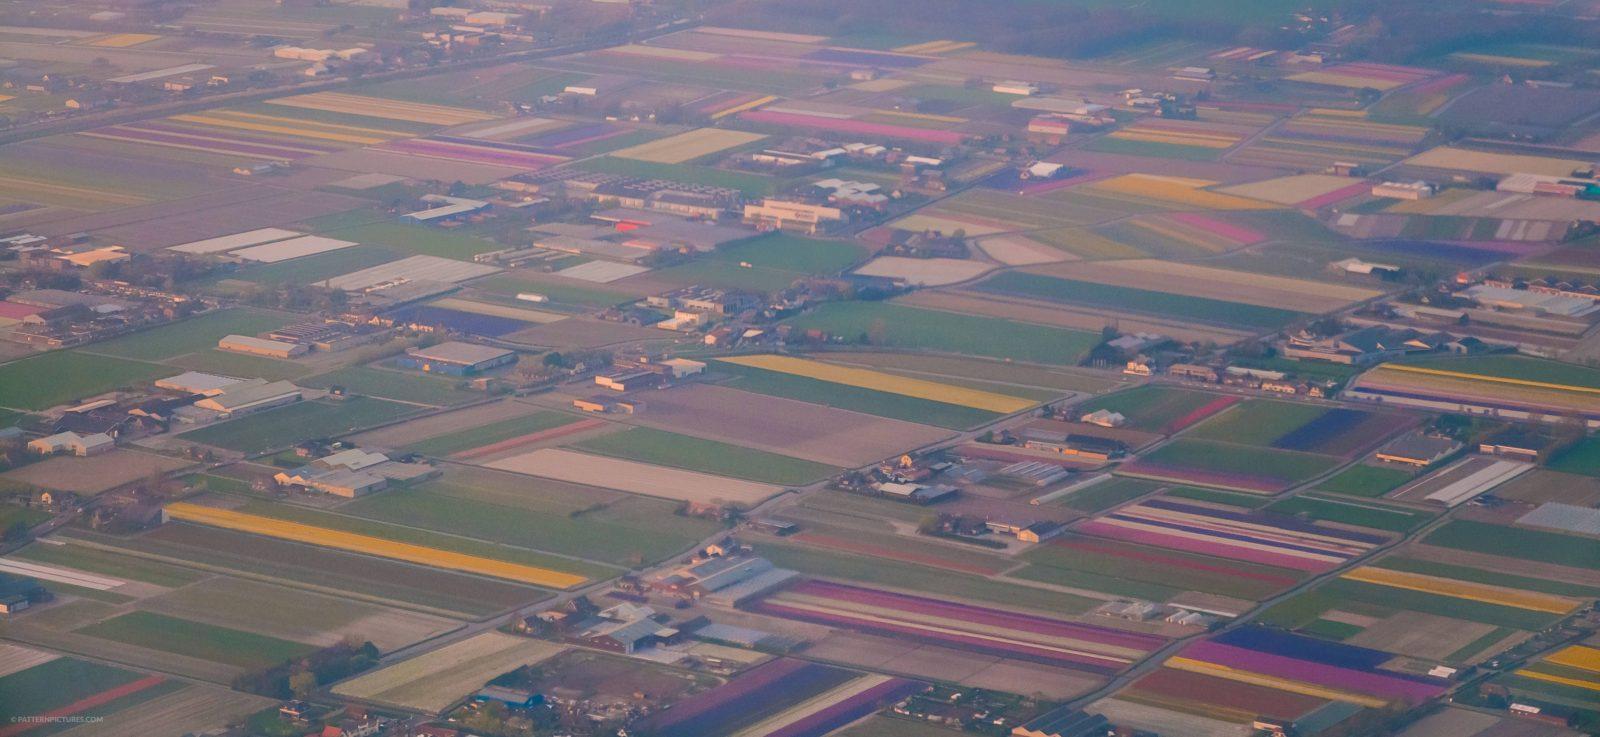 Landscape Netherlands airphoto flowerfields